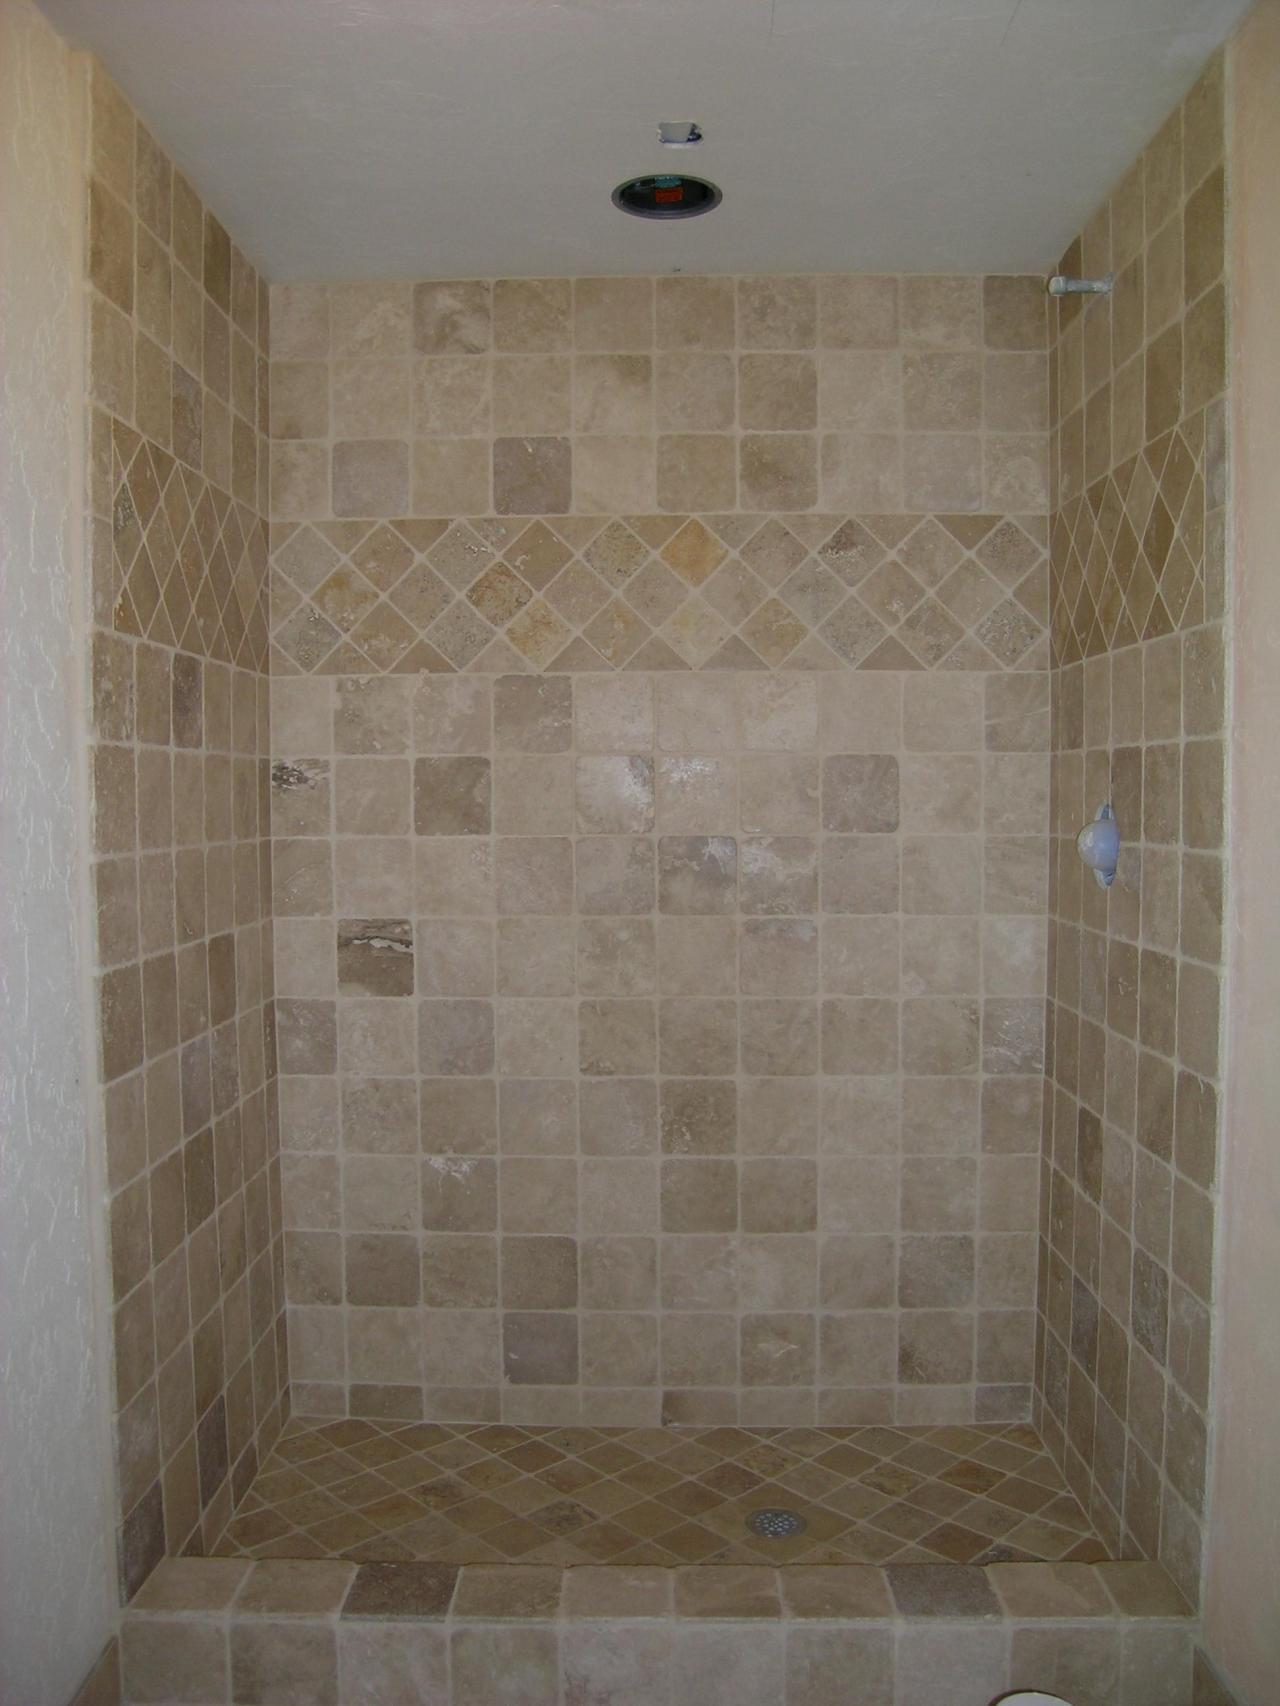 Tile A Bathroom : Stephenson Ceramic Tile Wood Floors Naples Shower Ceramic Tiles For Bathrooms on bamboo floors for bathrooms, cement countertops for bathrooms, lvt for bathrooms, marble for bathrooms, neutral decor for bathrooms, stainless steel sinks for bathrooms, cement board for bathrooms, metal tiles for bathrooms, black tile for bathrooms, wallpaper for bathrooms, silestone countertops for bathrooms, commercial tile for bathrooms, duraceramic for bathrooms, porcelain for bathrooms, plastic tile for bathrooms, vintage tile for bathrooms, tile trends for bathrooms, cork for bathrooms, mirrors for bathrooms, flooring for bathrooms,